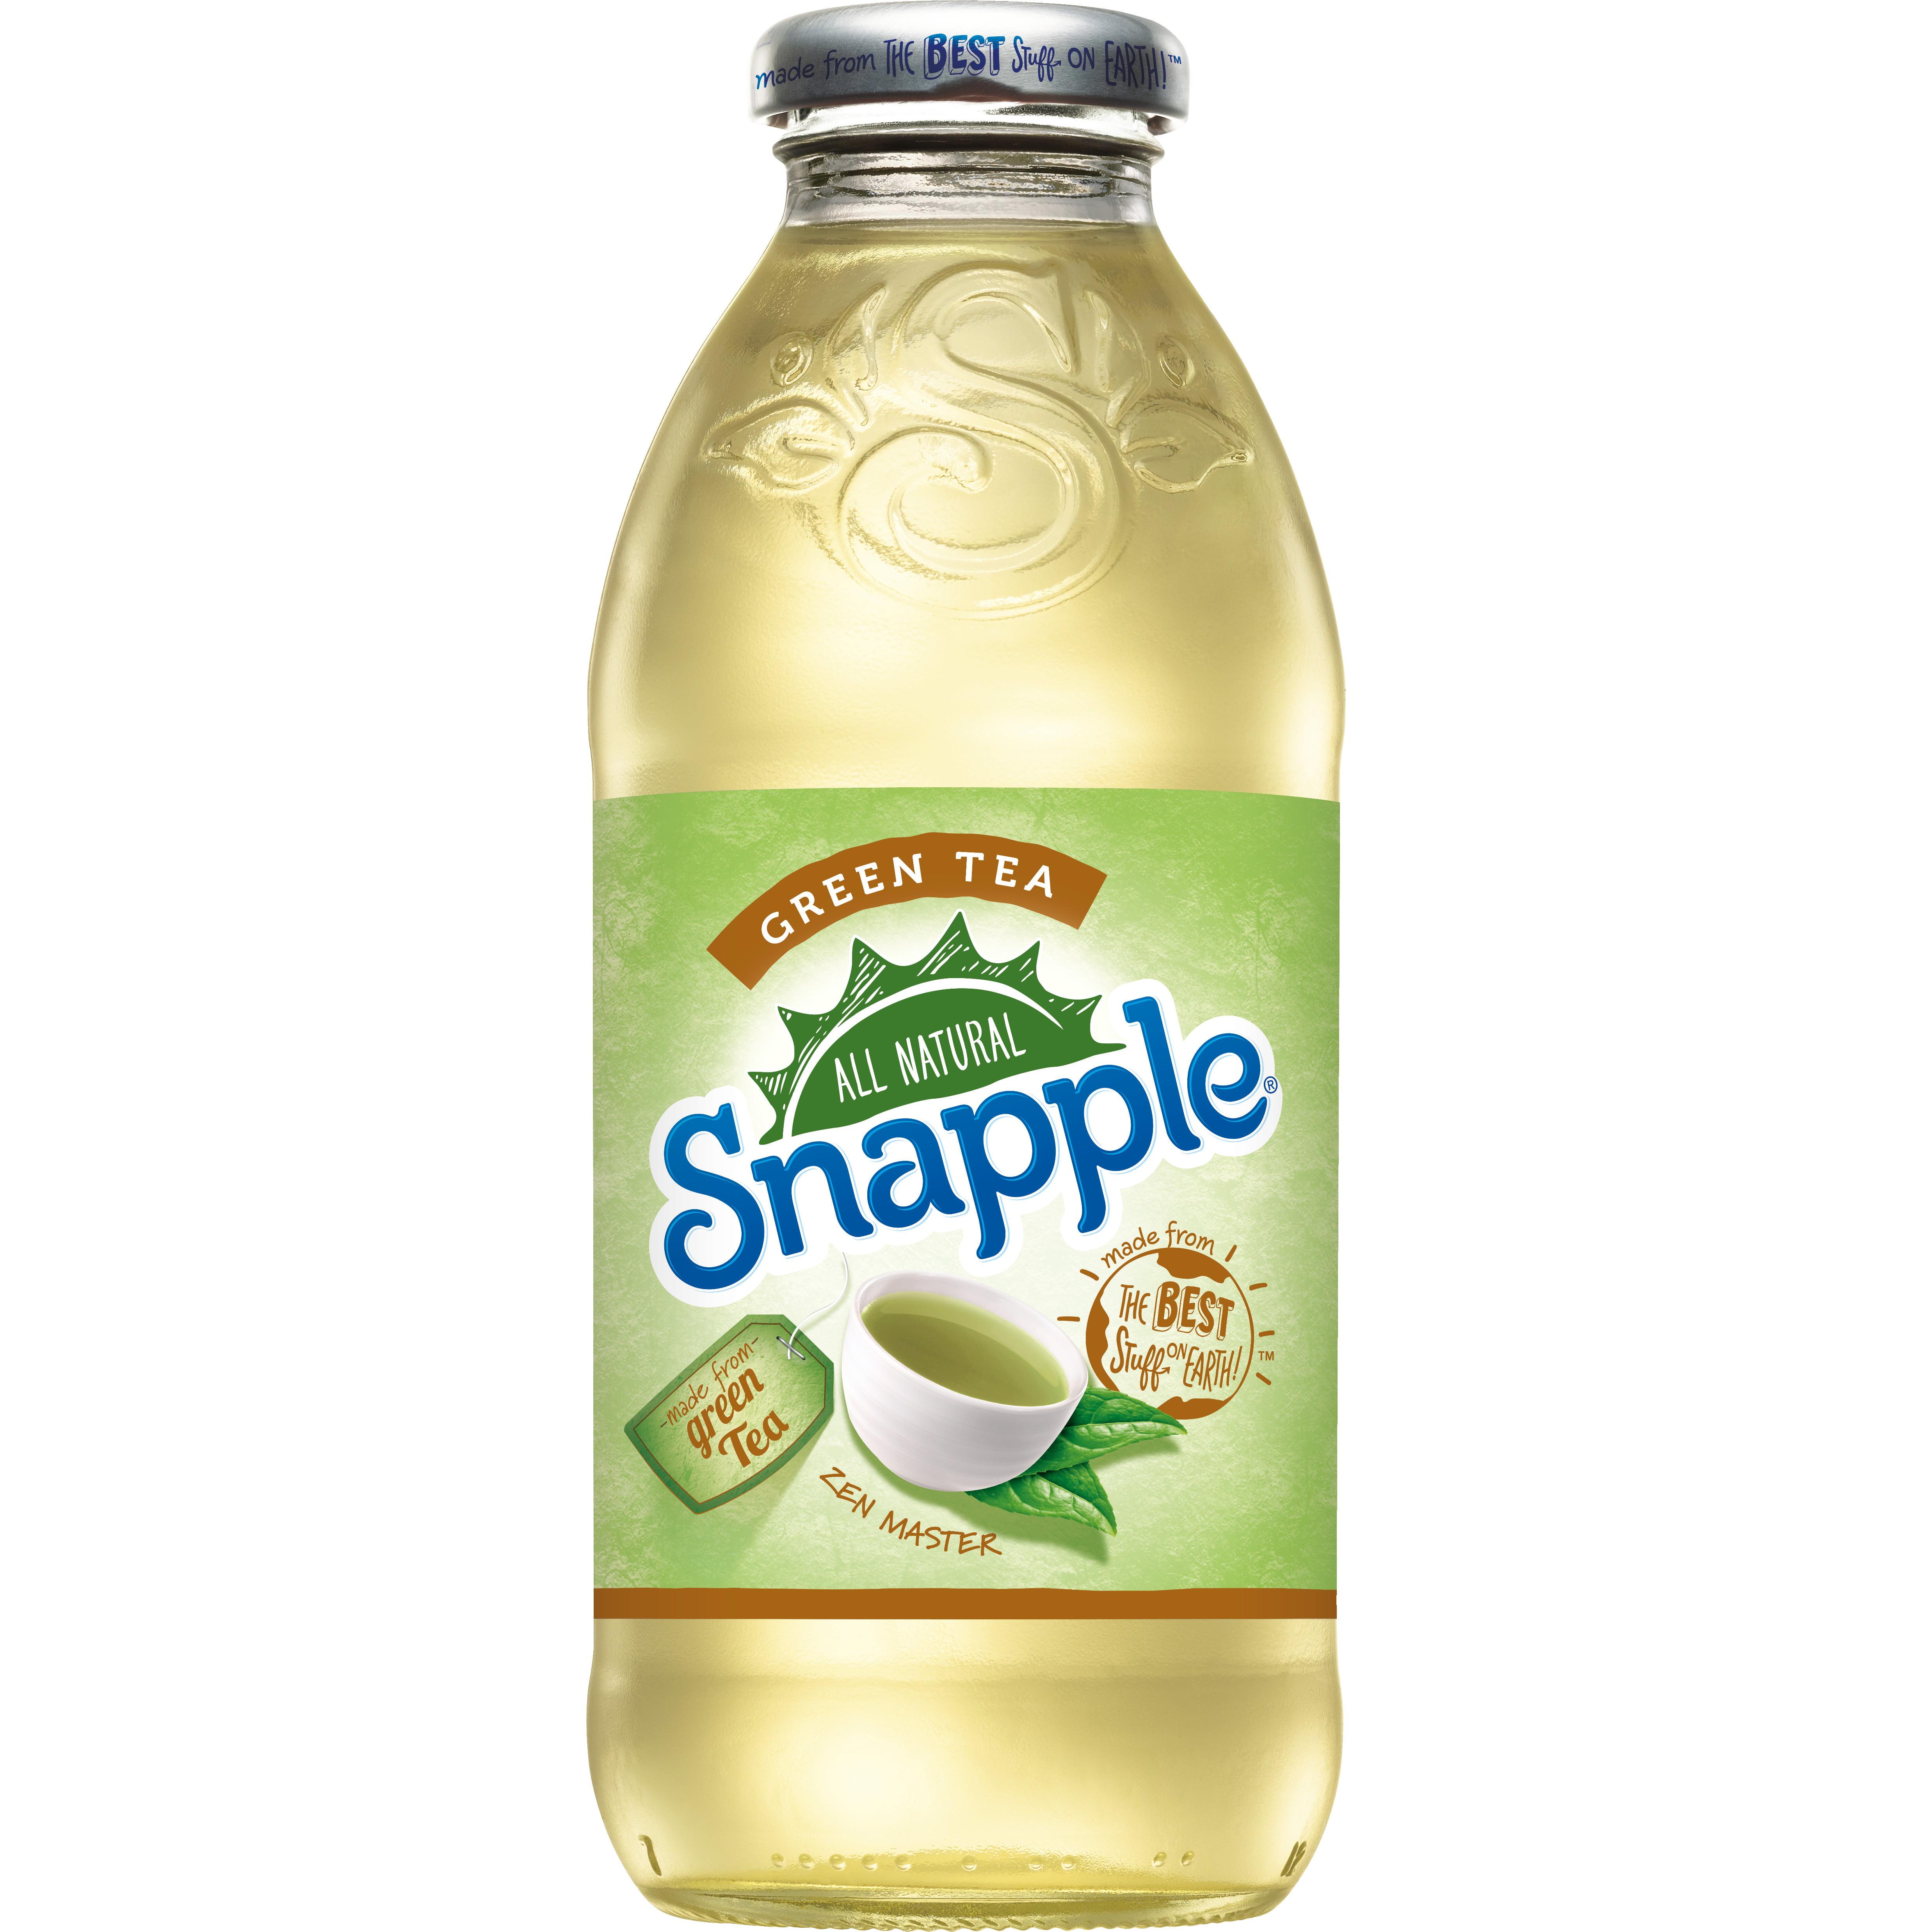 Snapple Green Tea, 16 fl oz